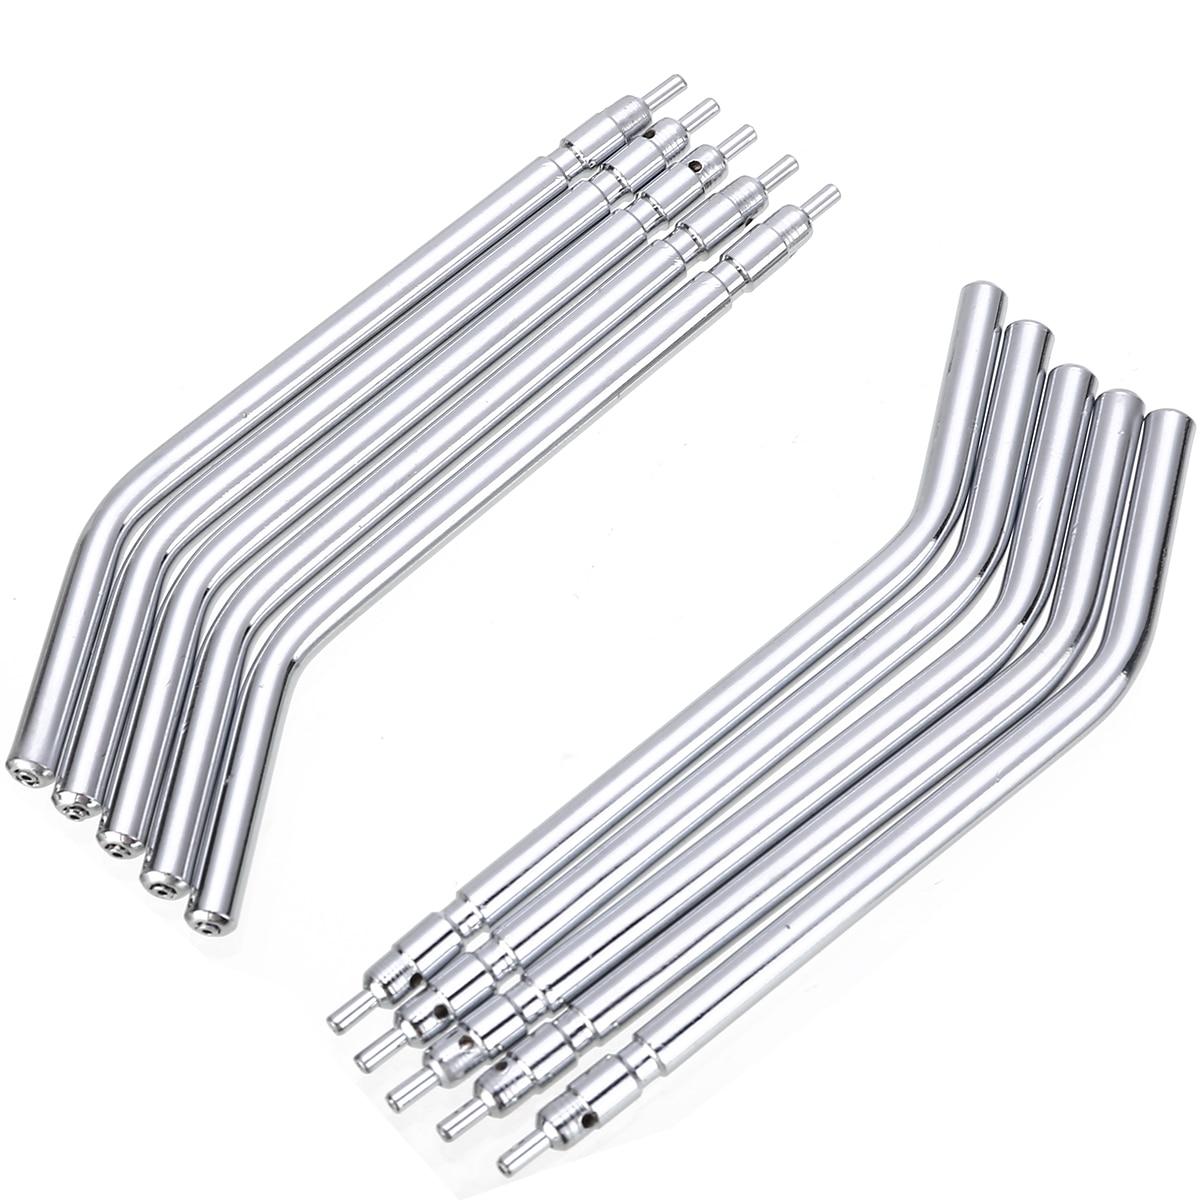 10Pcs Stainless Steel Dental Syringe Tips 3 Way Dental Air Water Syringe Spray Nozzles Tips Tube For Teeth Whitening